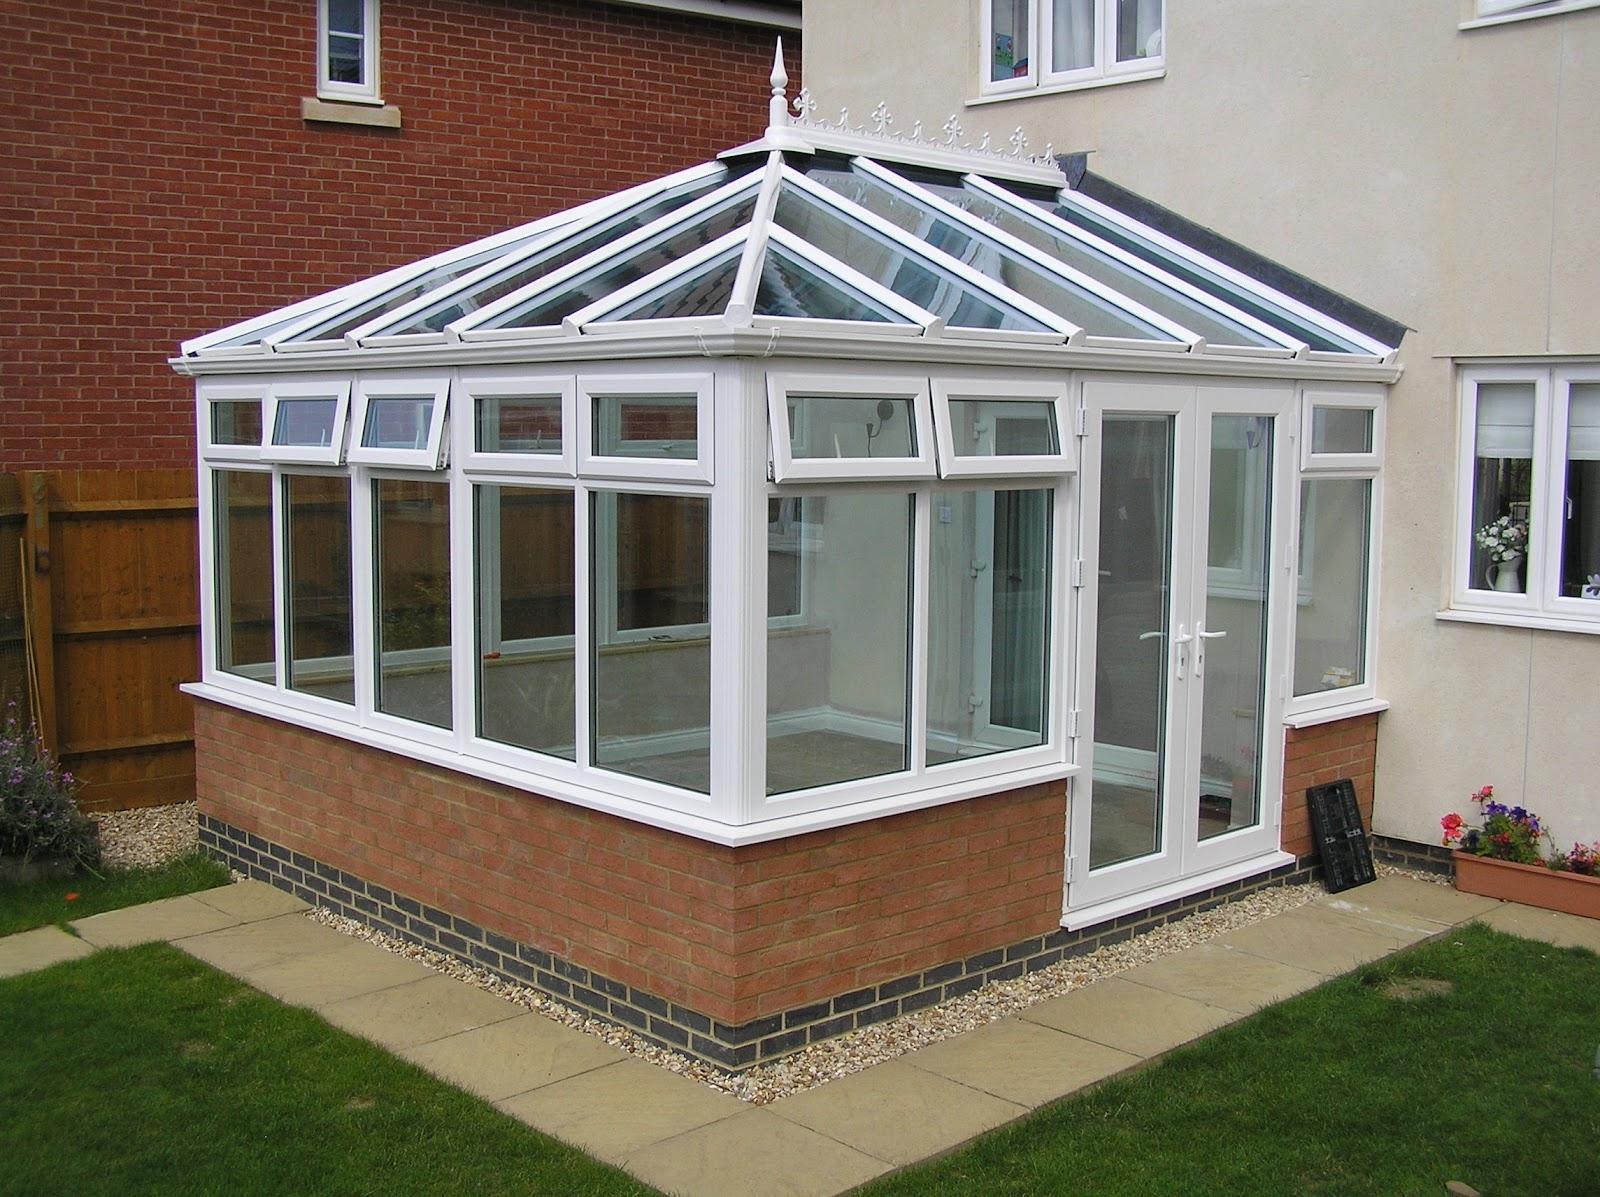 Edwardian_conservatory.jpg